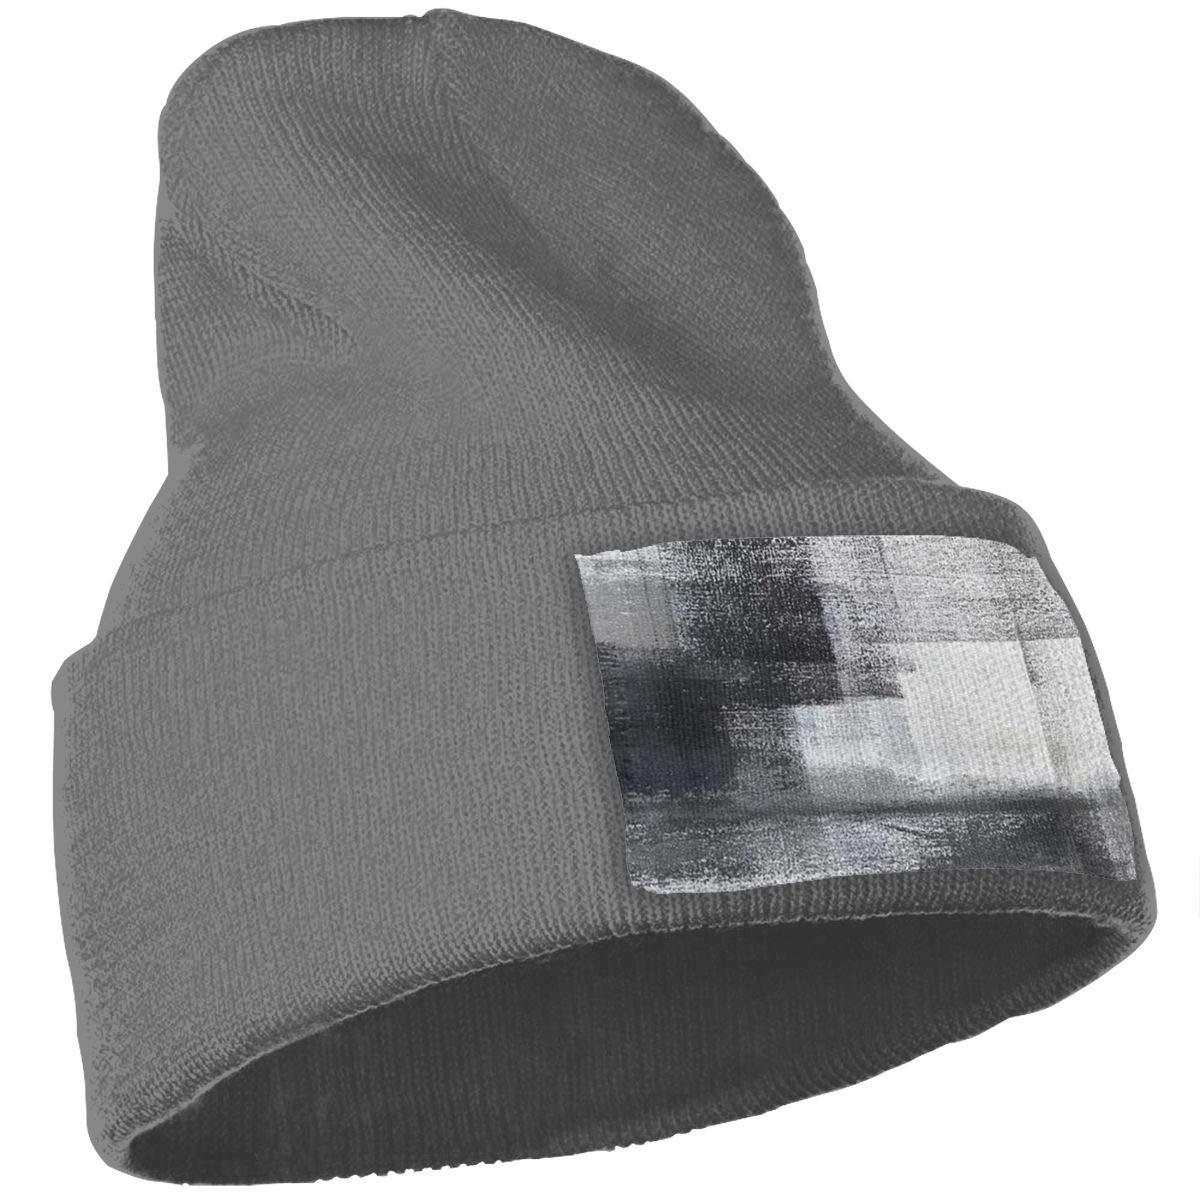 Mottled Mens Womens Stylish Knit Beanie Hat Slouchy Wrinkled Cap